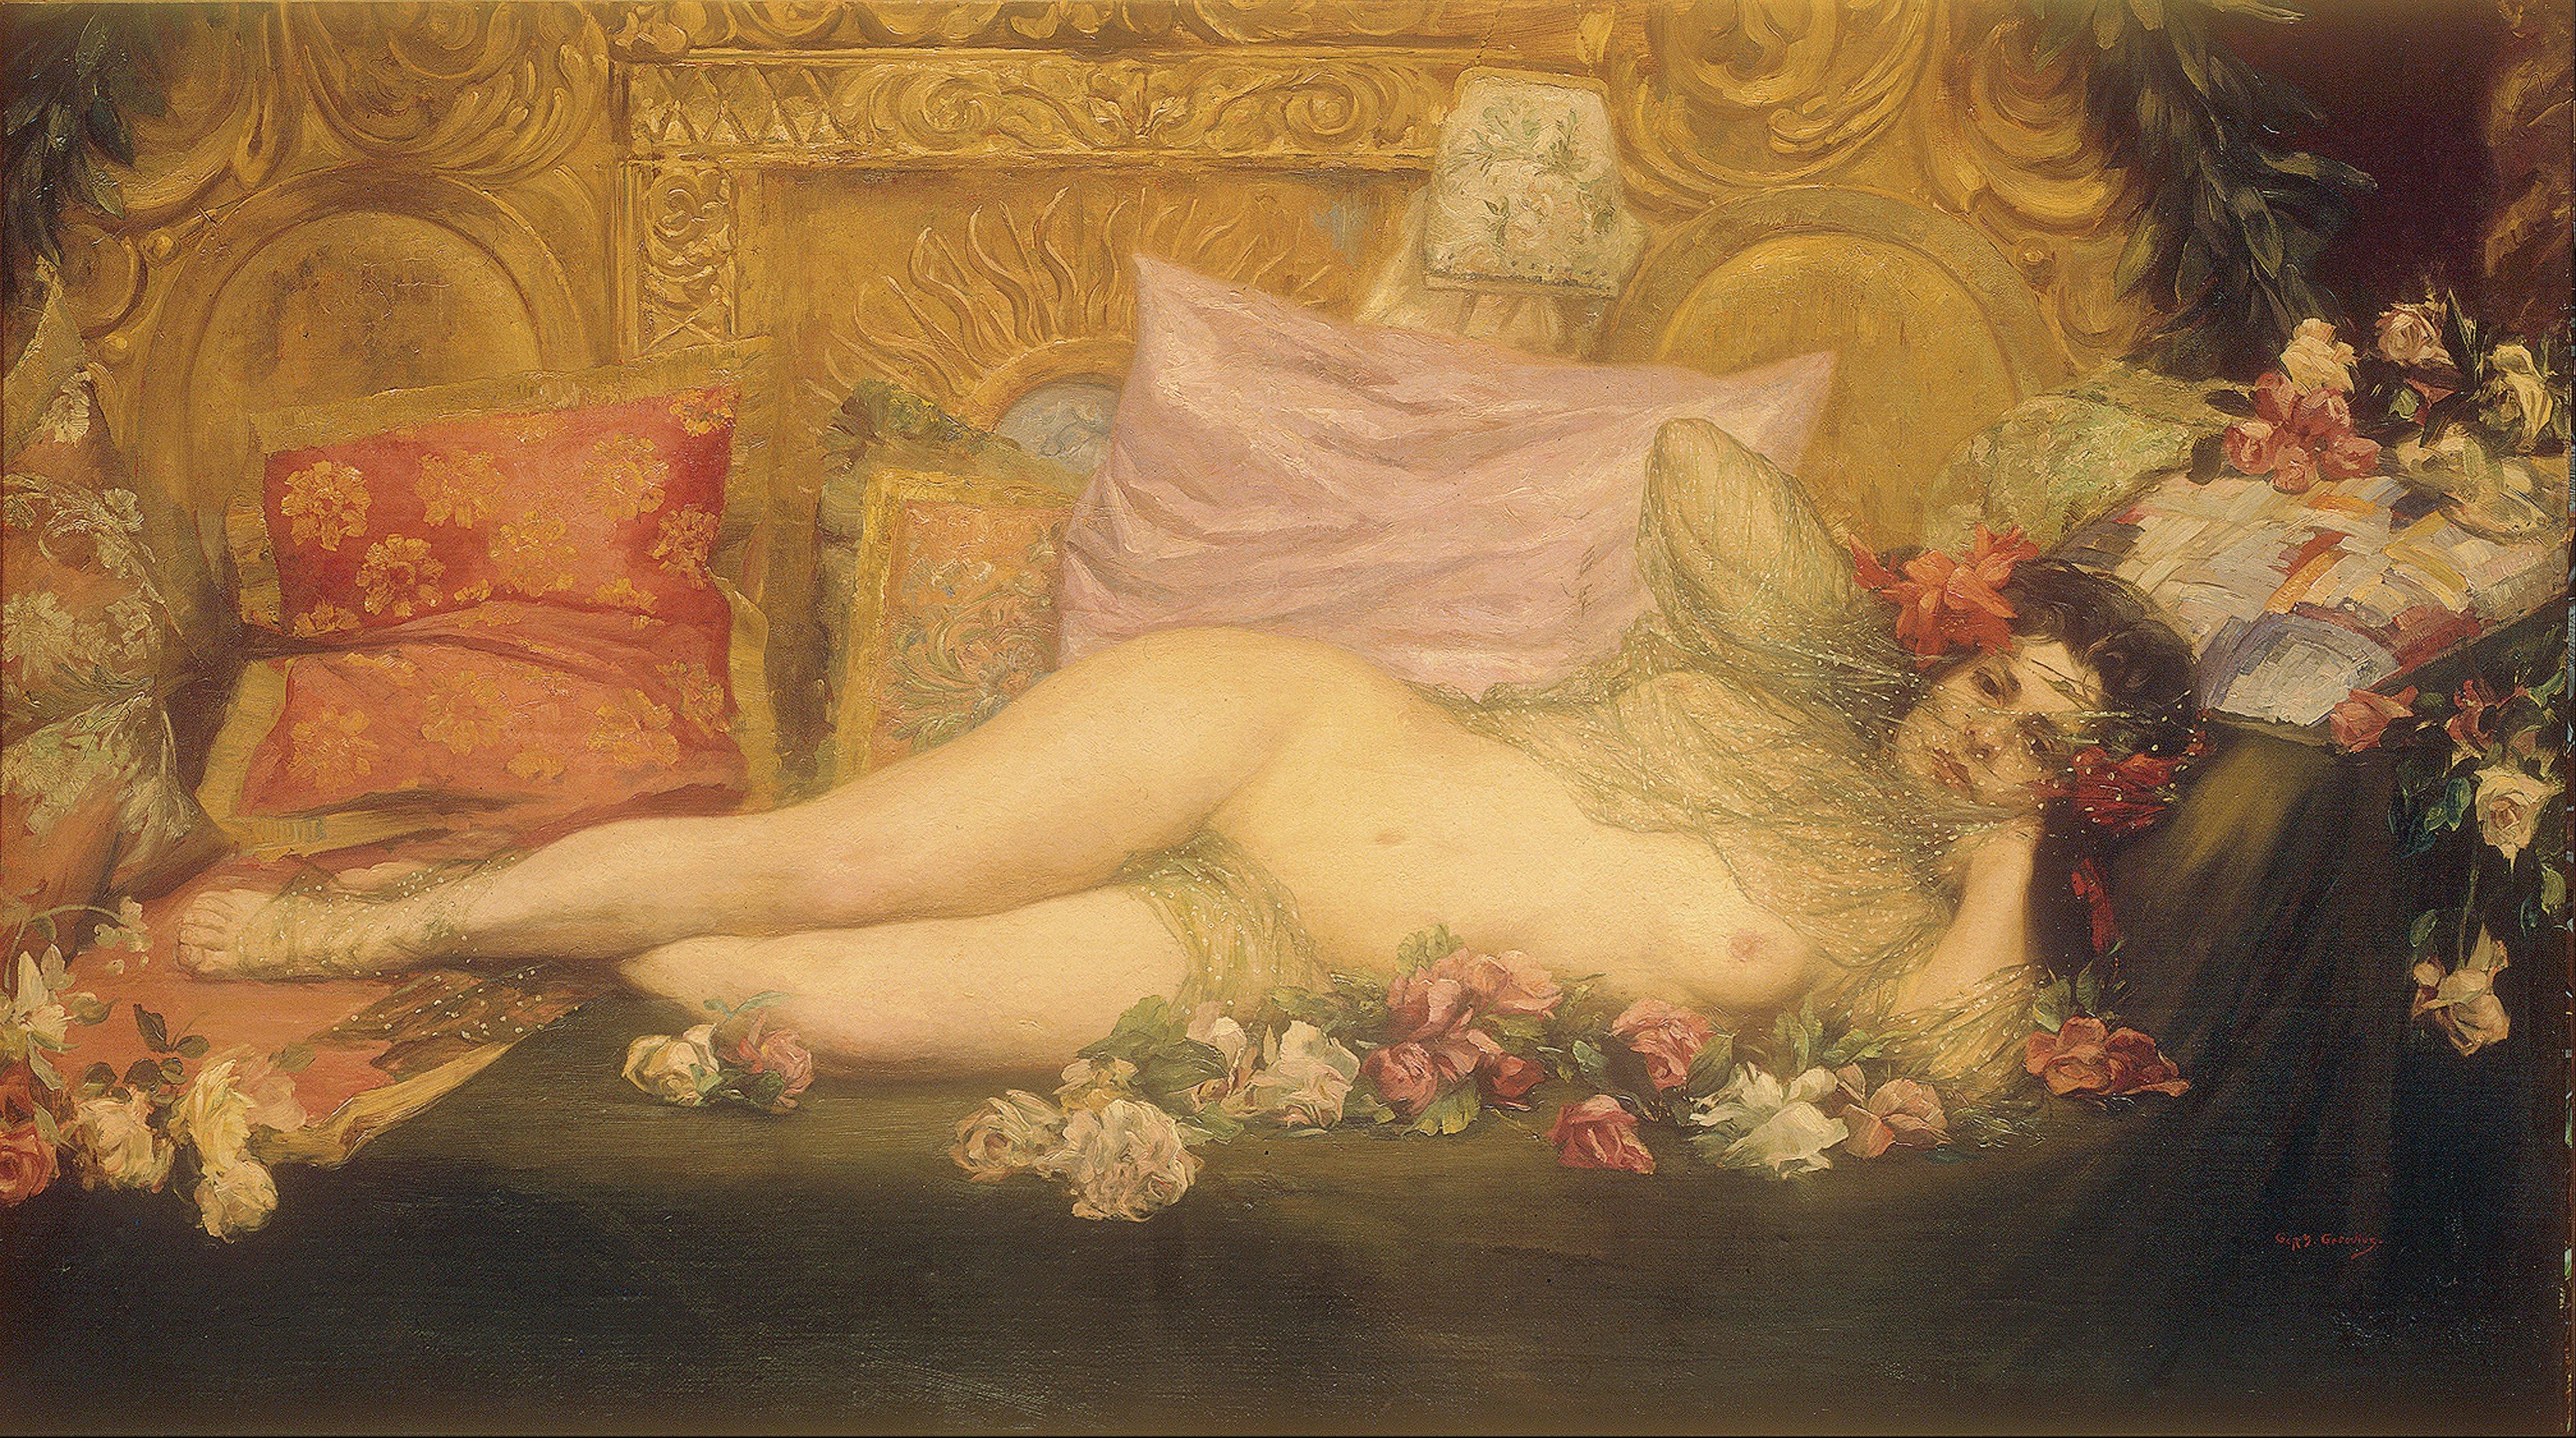 Renaissance nude digital art by rob prince